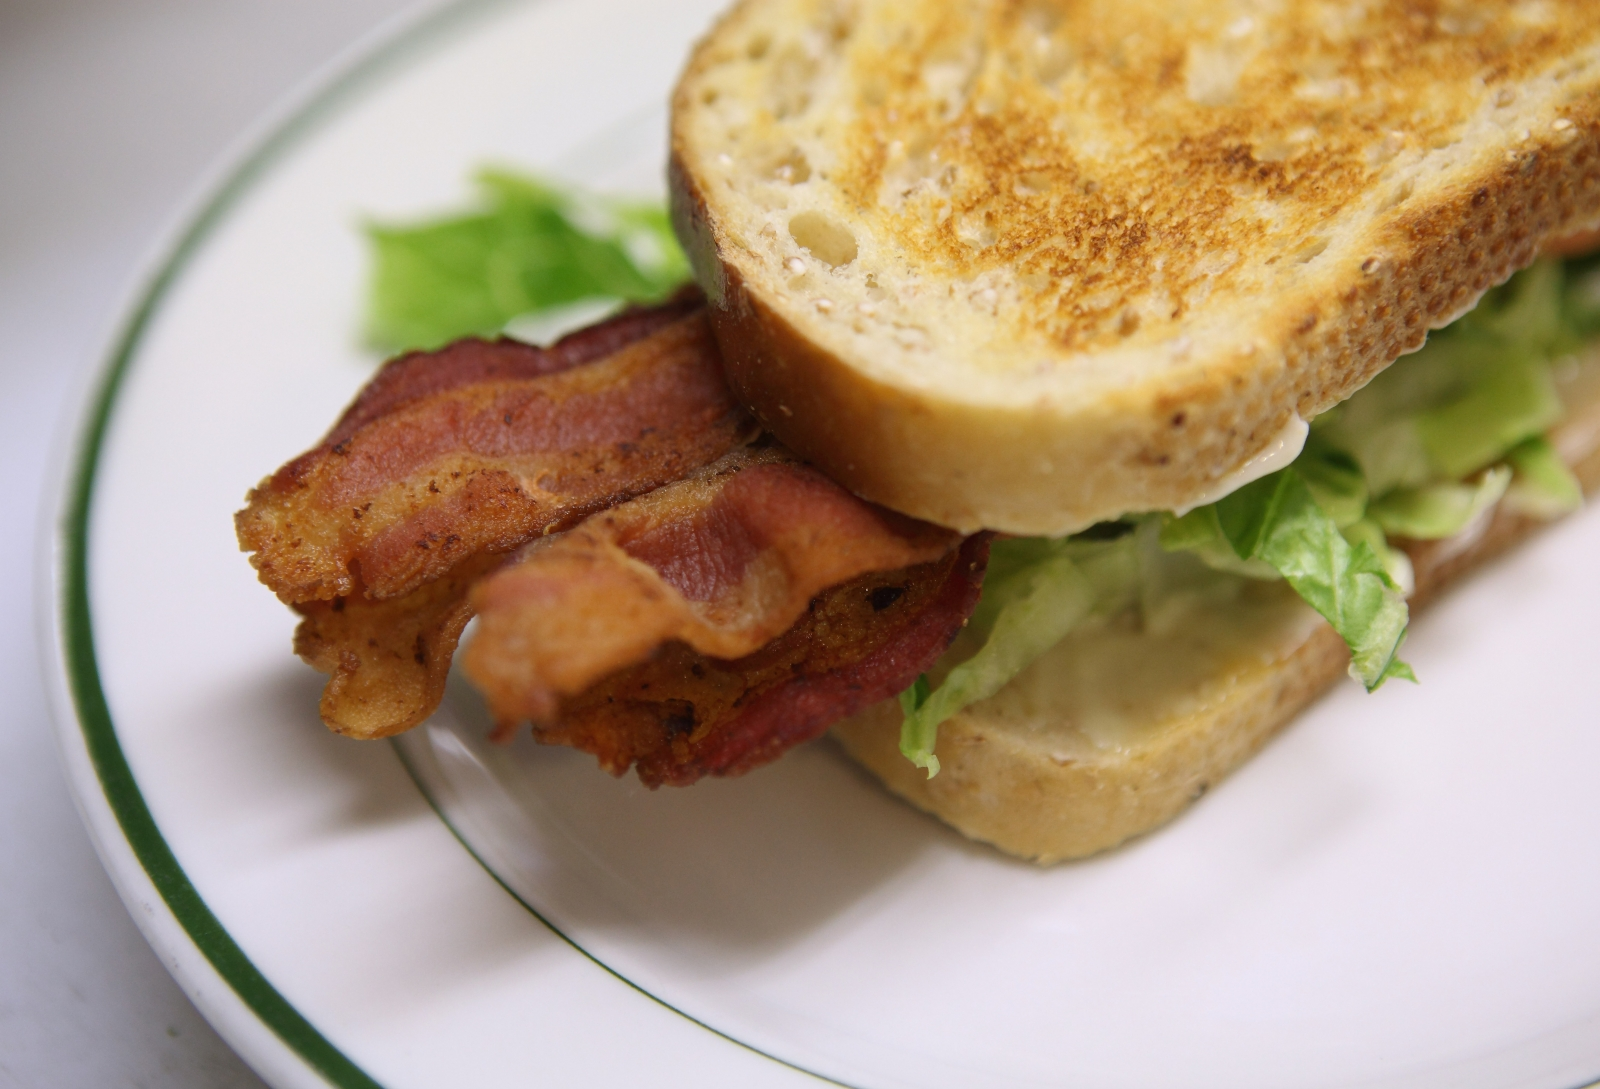 Schools in Islington can still serve pork, after all